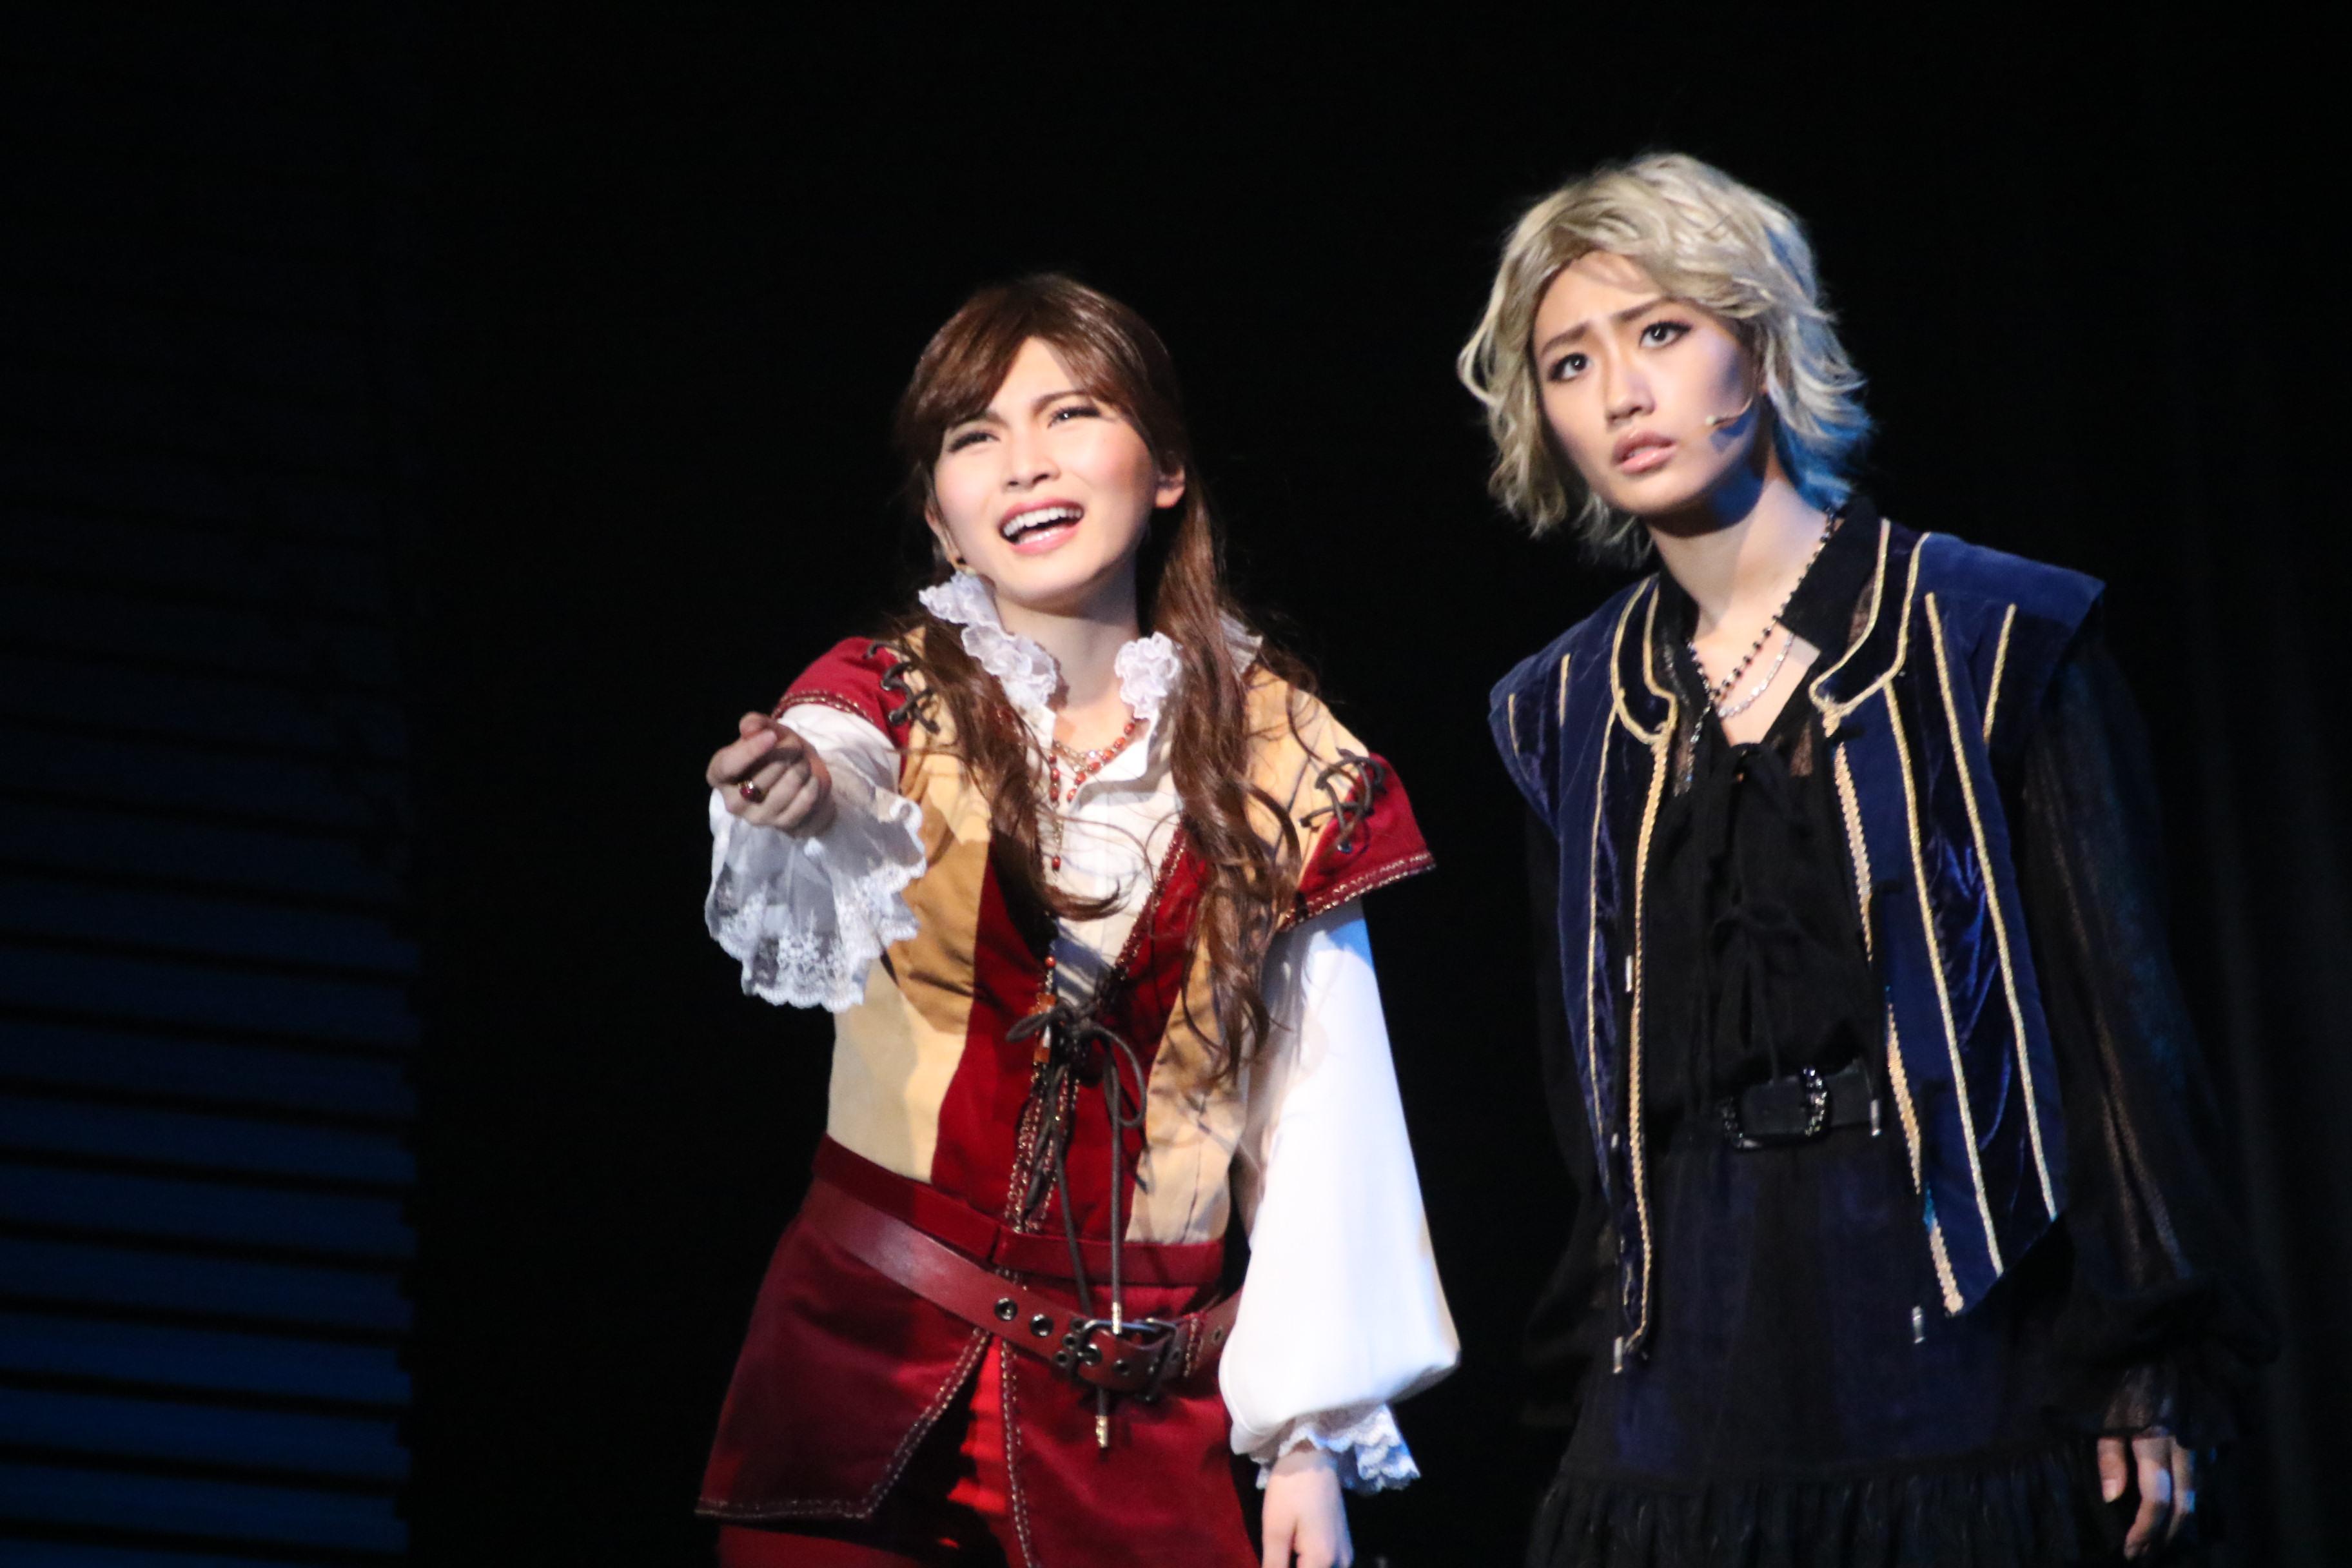 黒組公演。福岡(左)と藤田